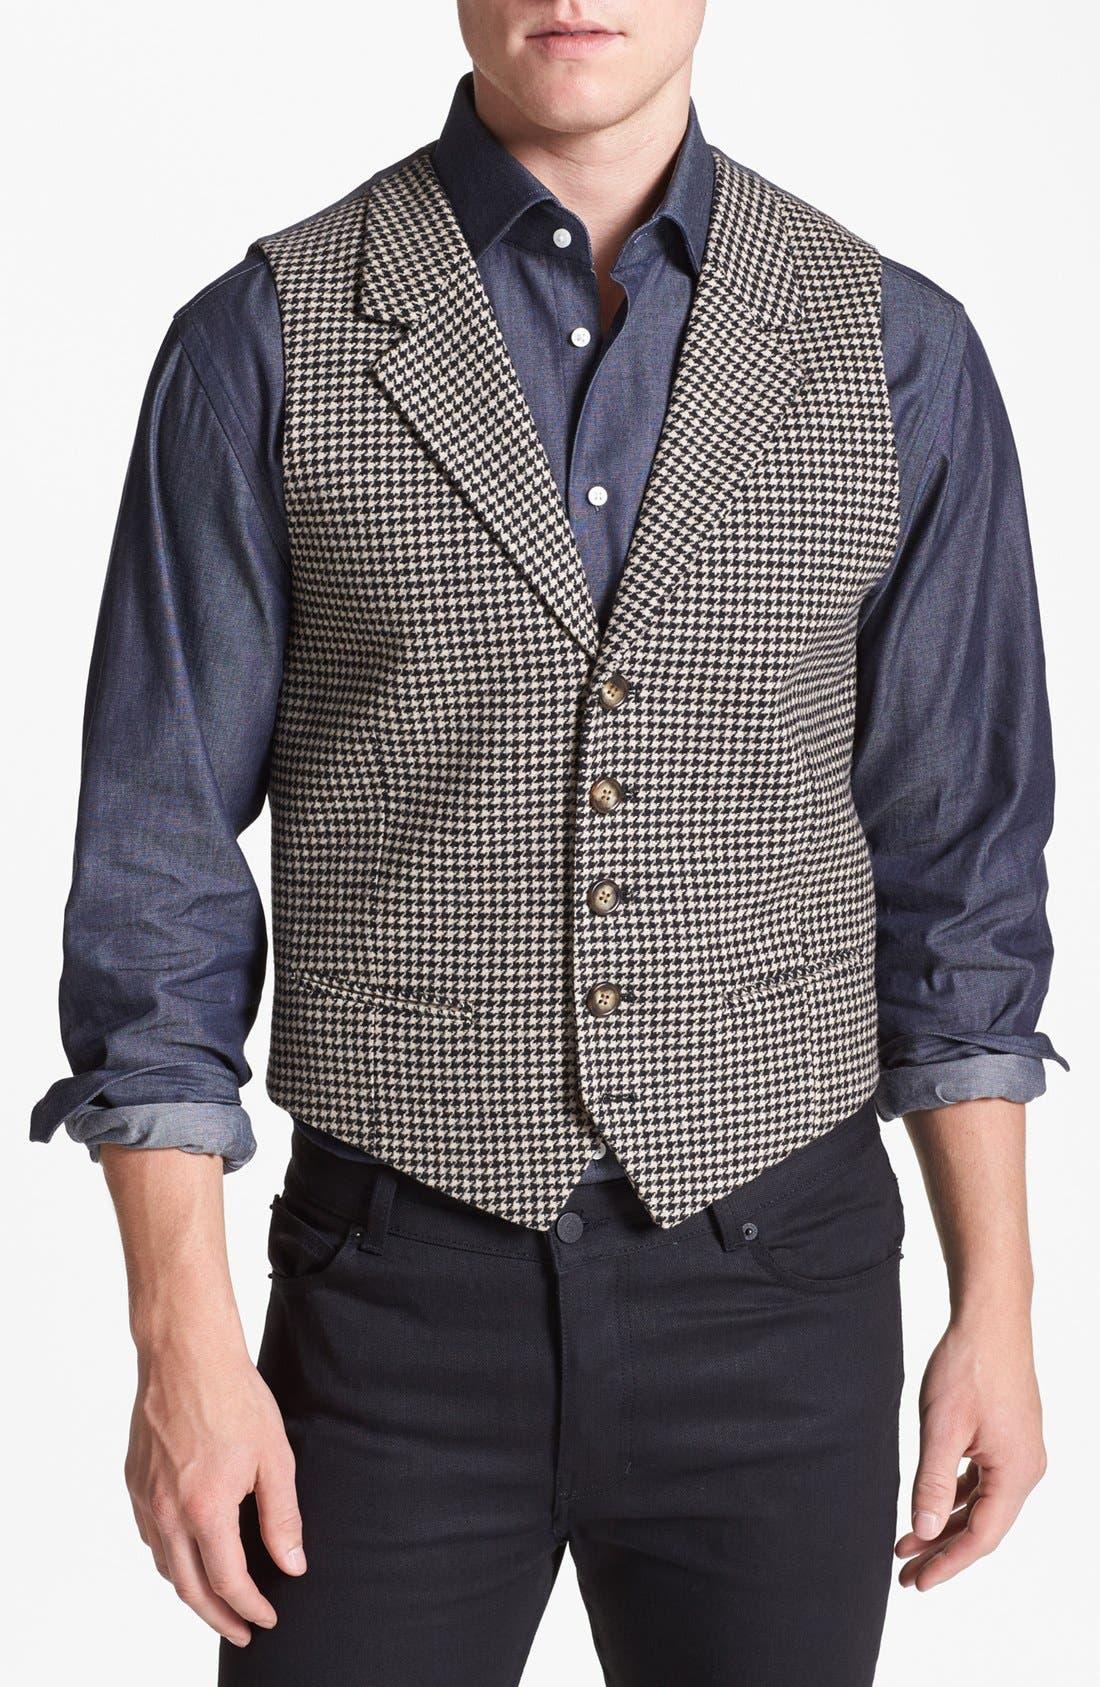 Alternate Image 1 Selected - Wallin & Bros. Trim Fit Houndstooth Vest